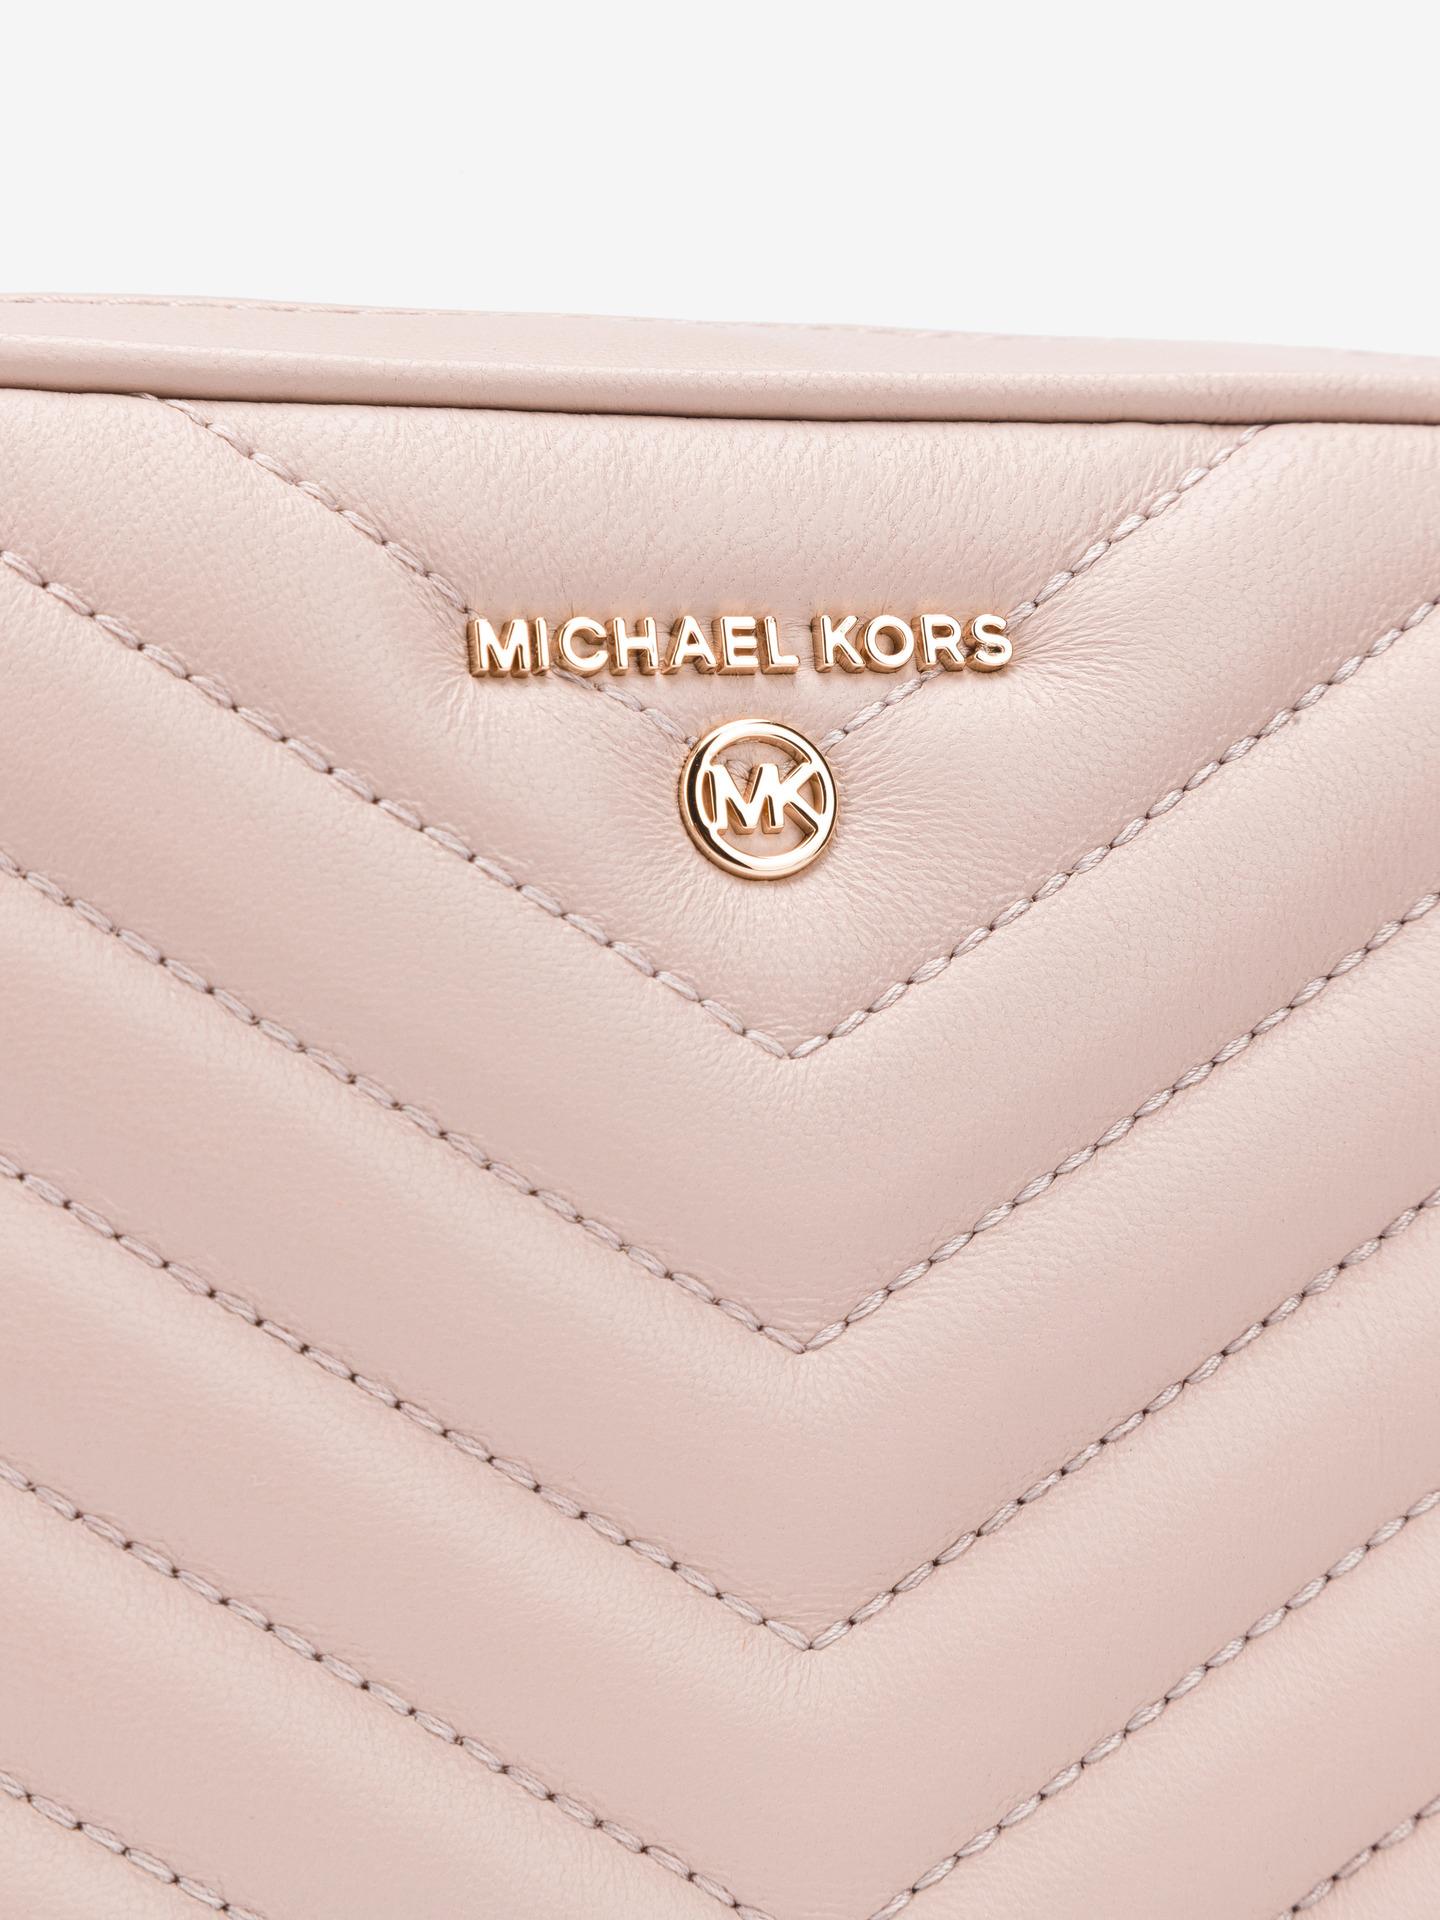 Michael Kors Borsetta donna beige